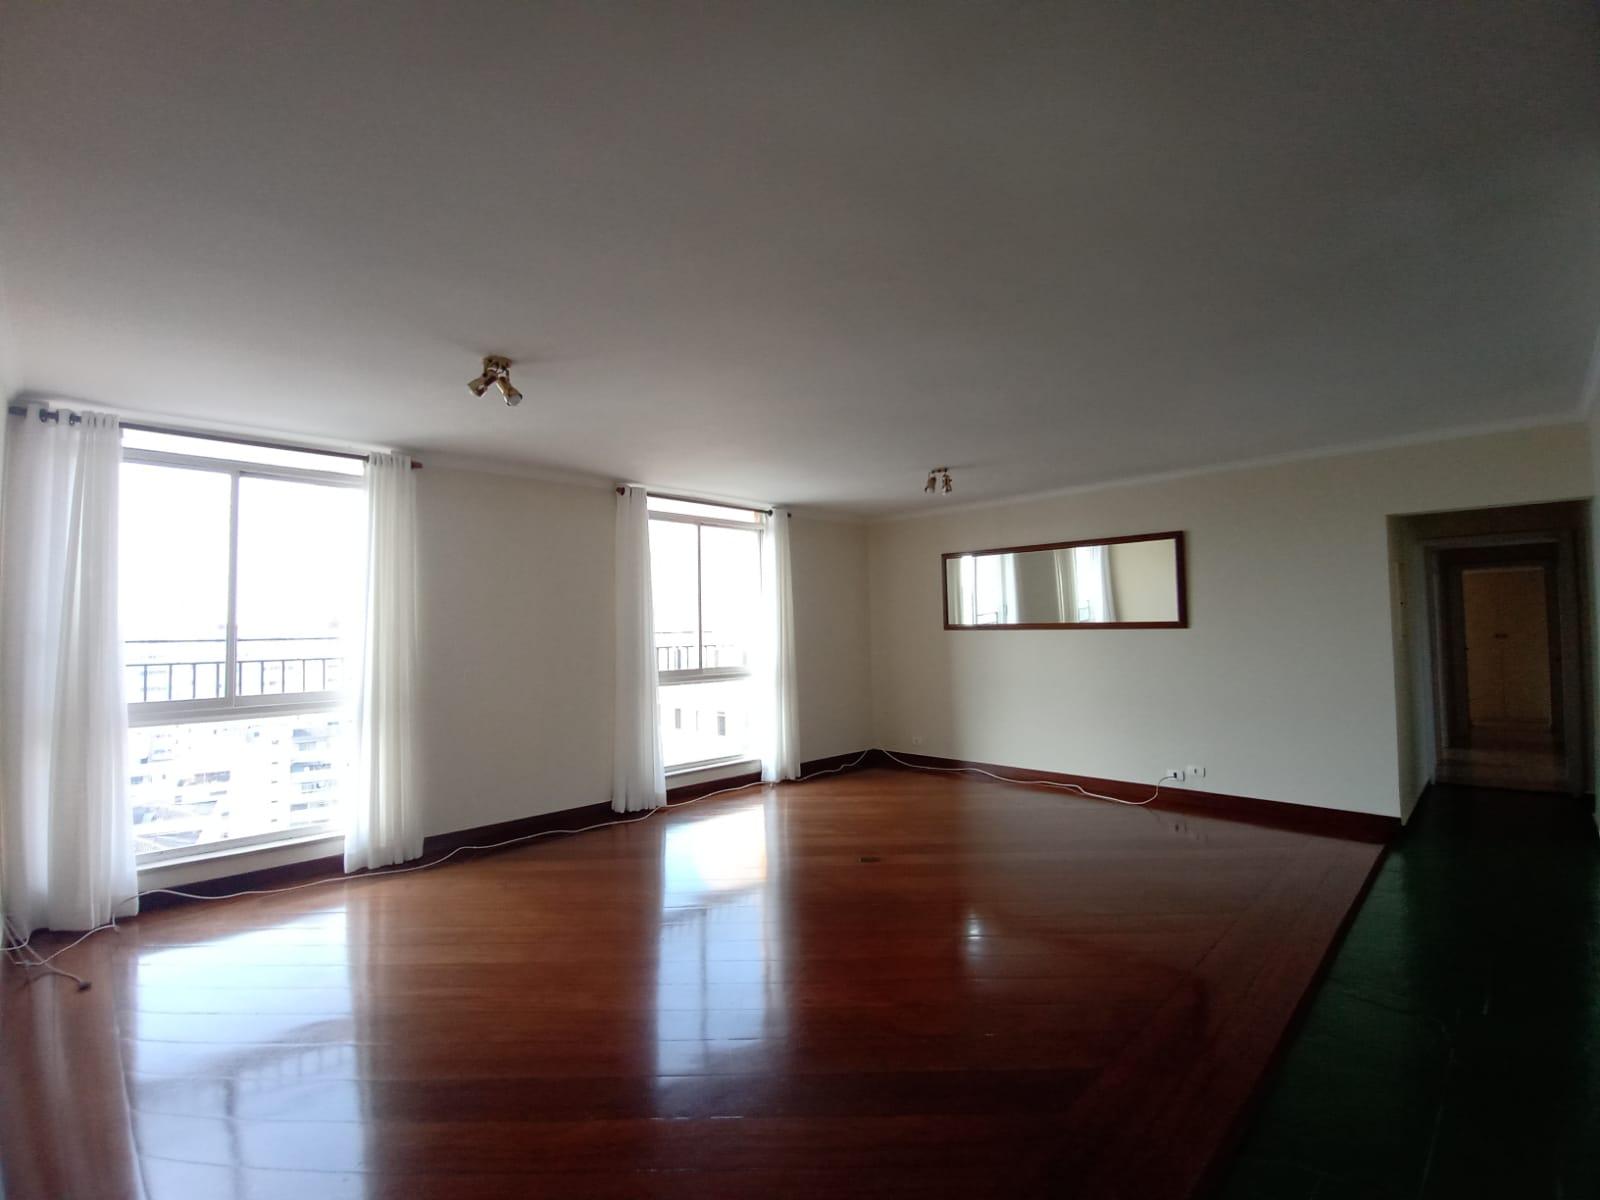 Apartamento para alugar, Bela Vista, sao paulo